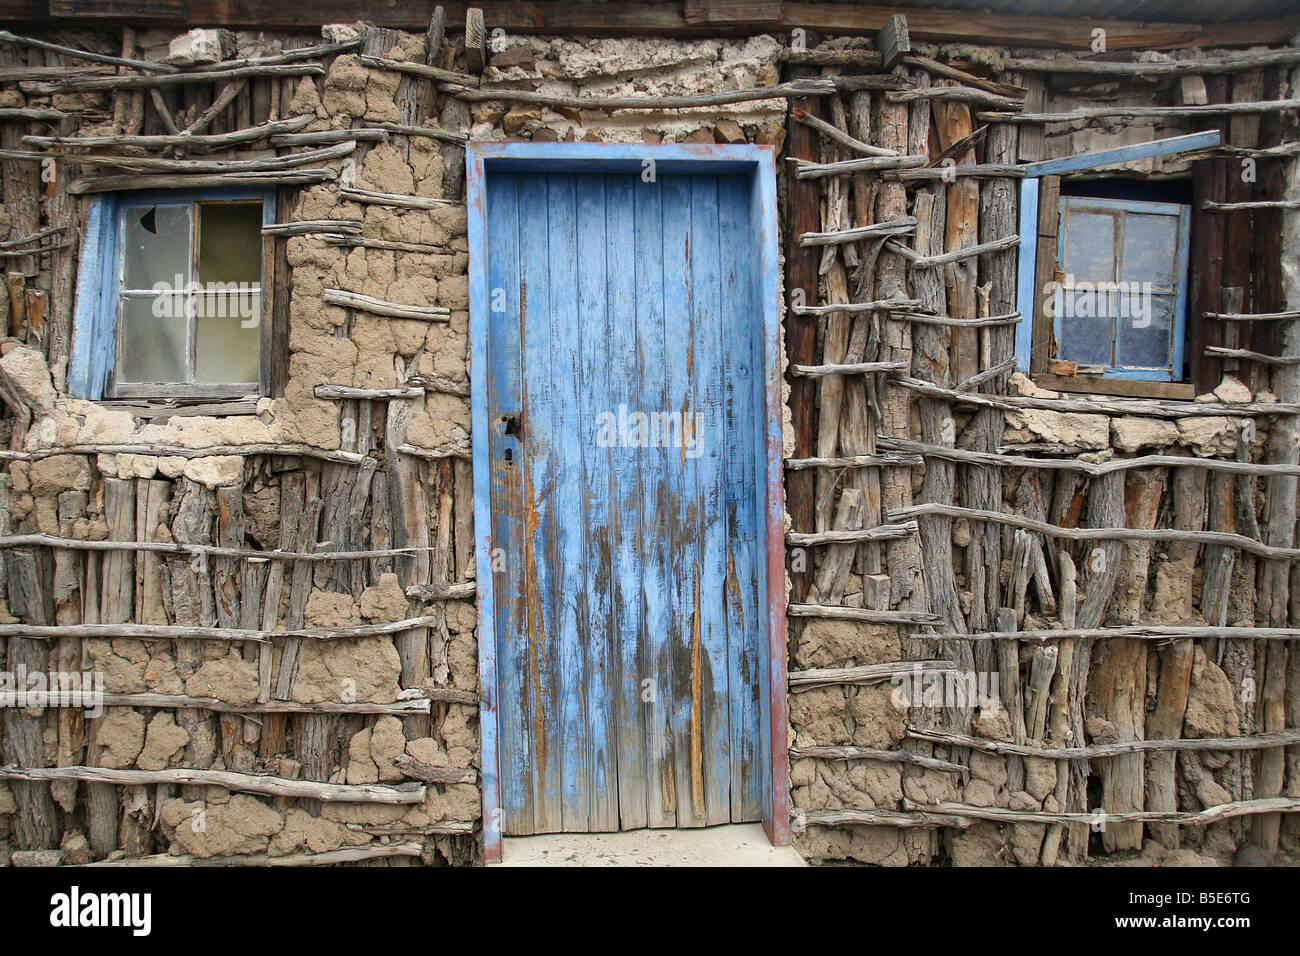 Mud & stick hut, Lubombo, Swaziland, Africa - Stock Image